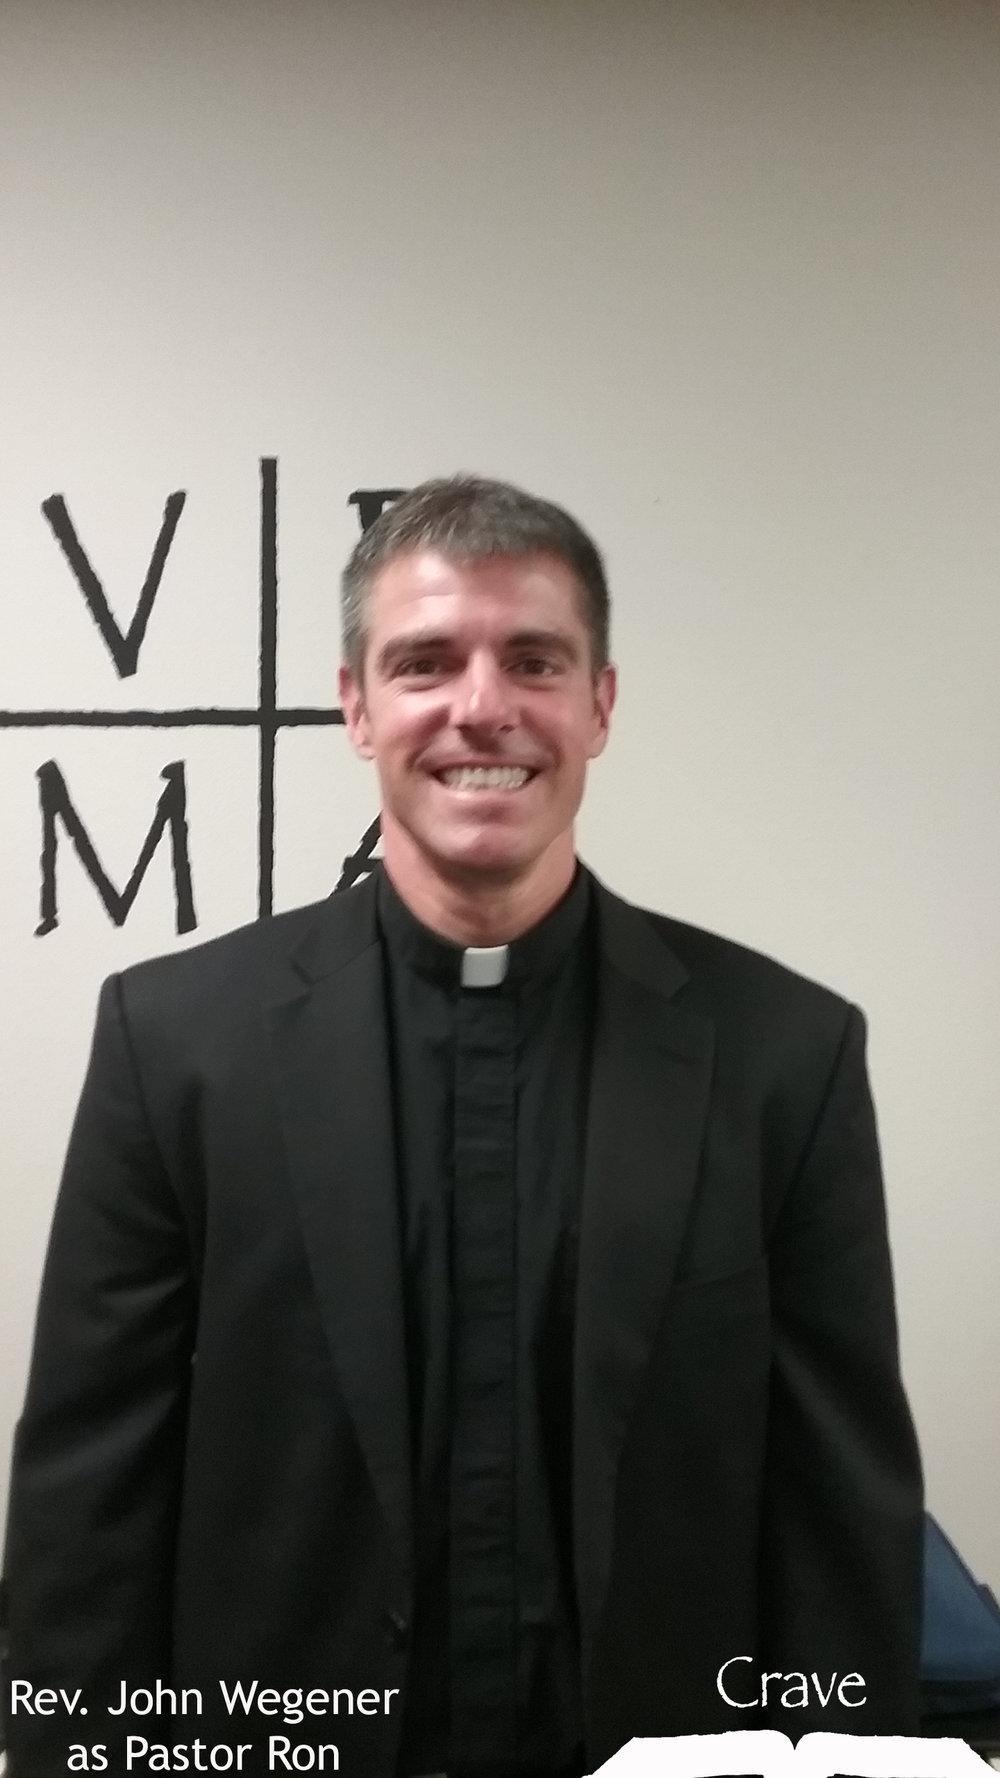 John Wegener - Pastor Ron